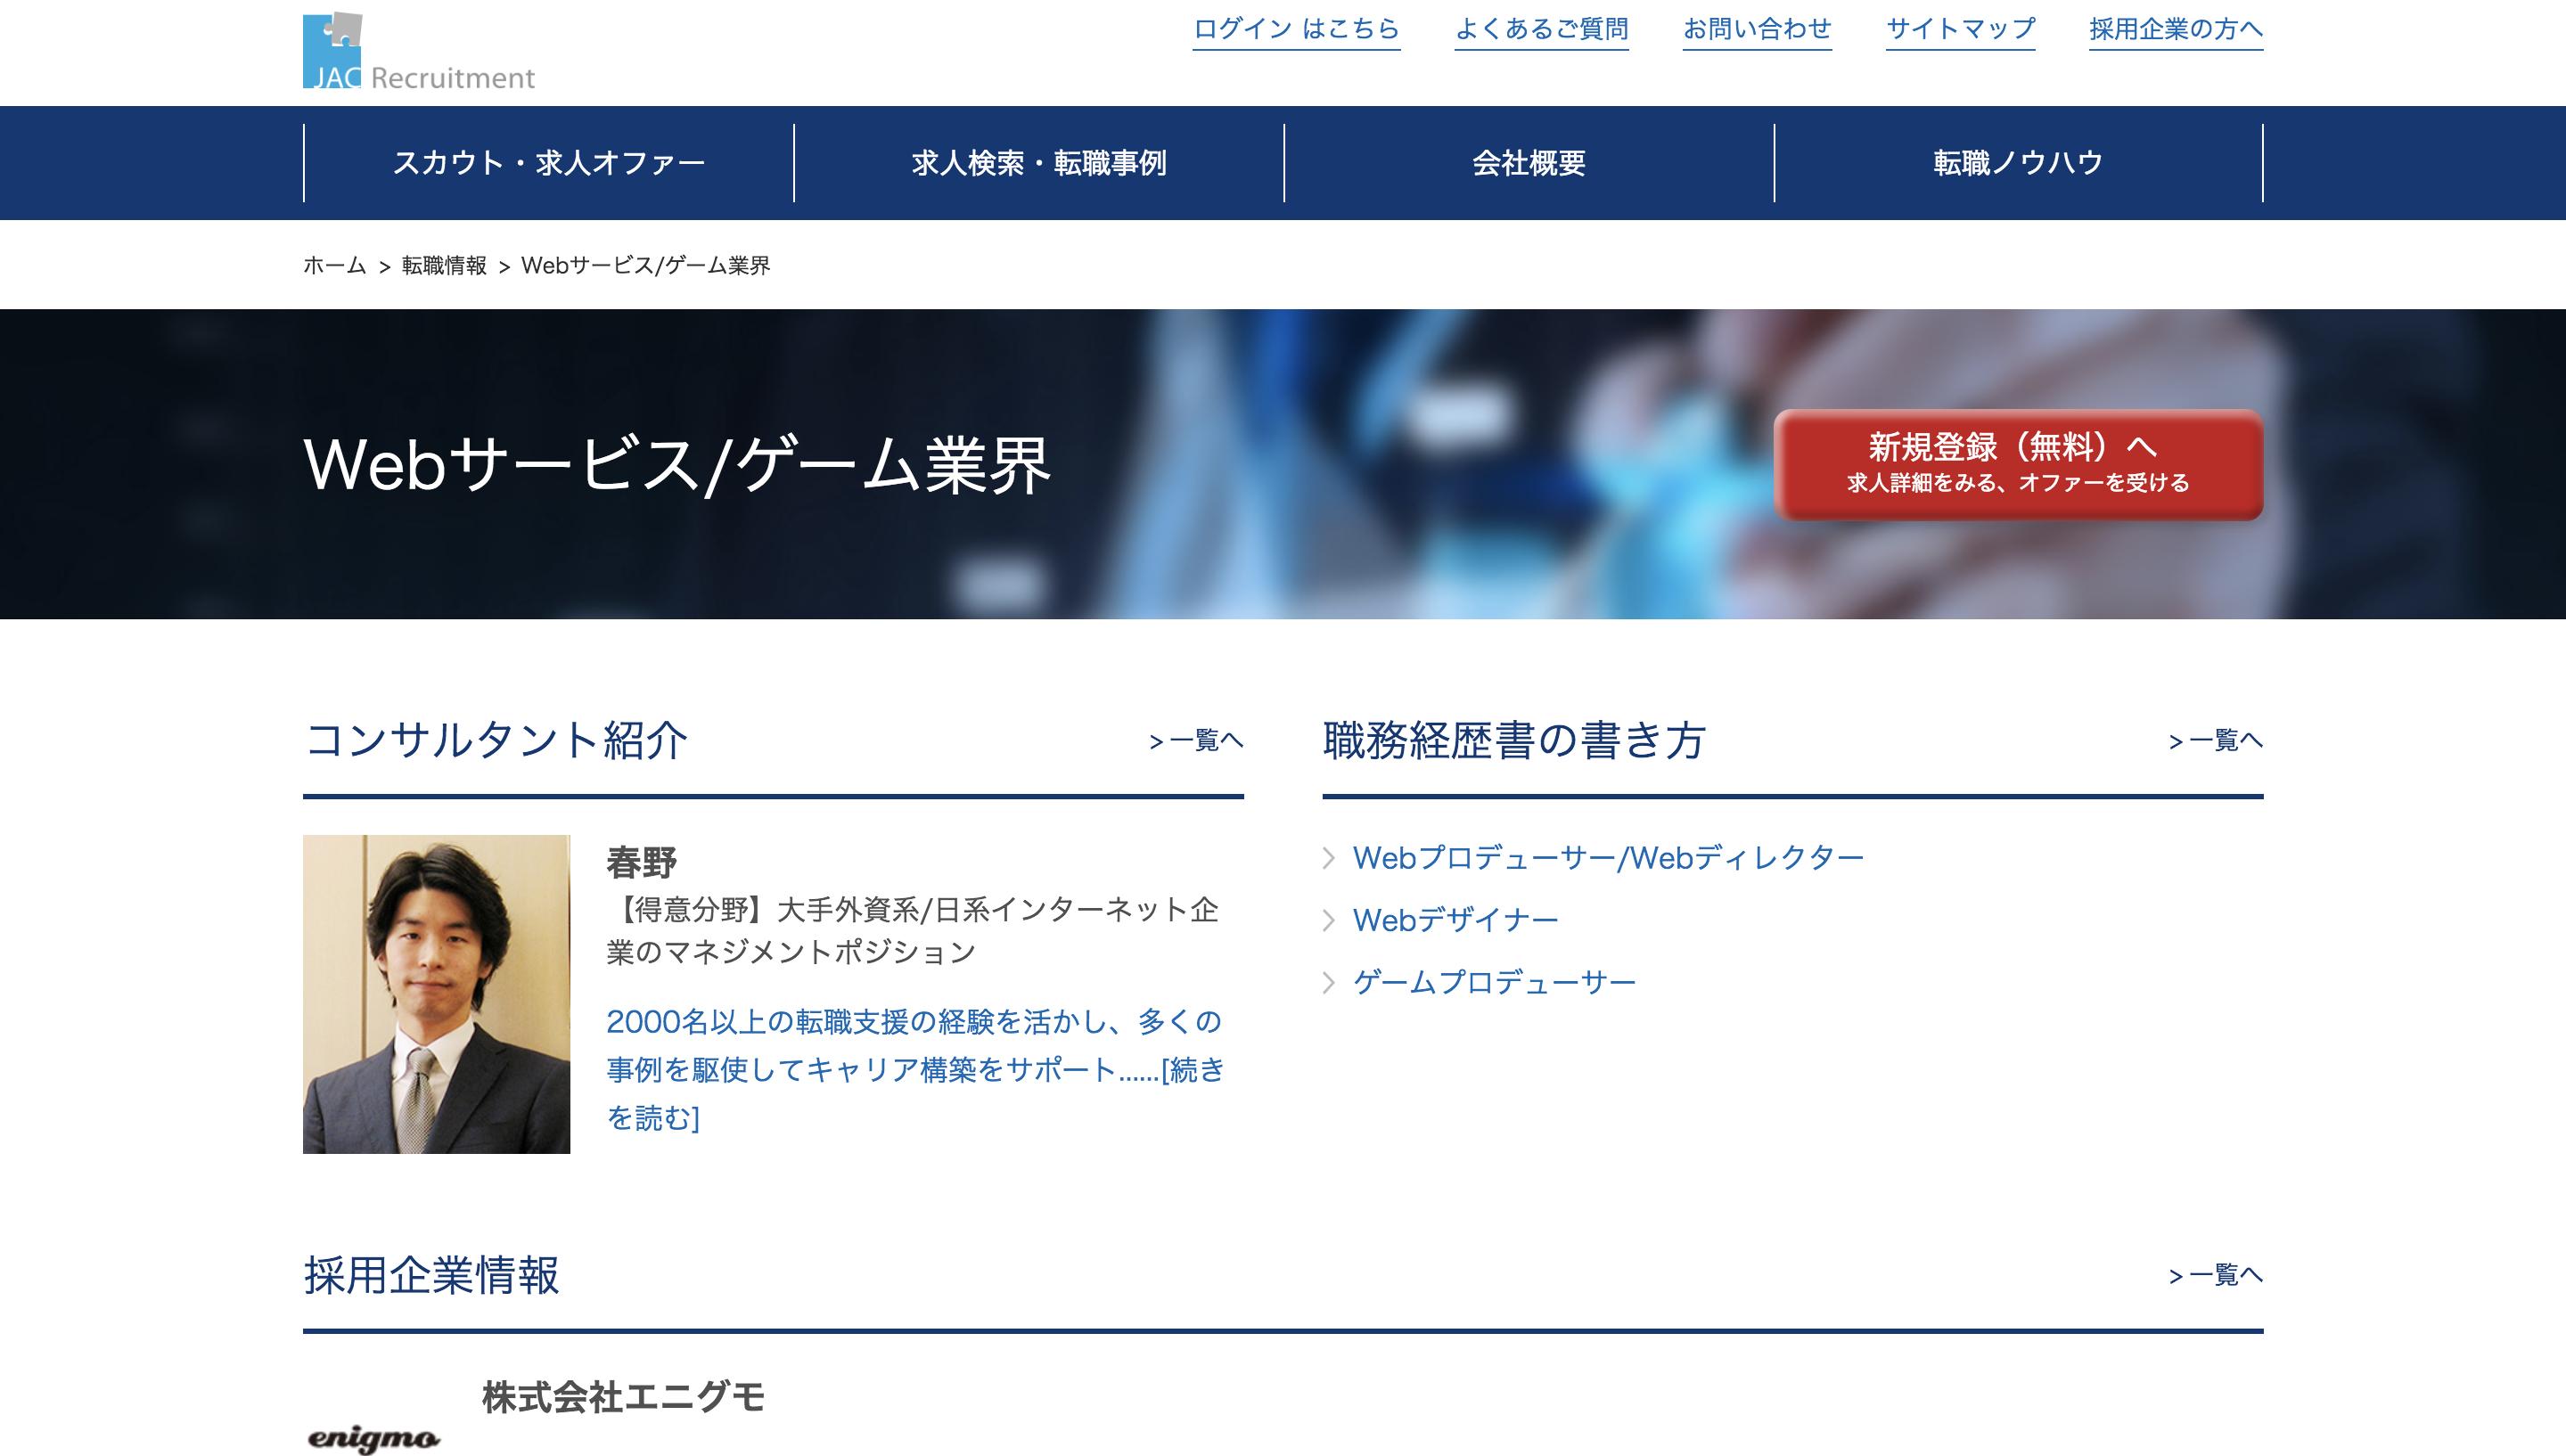 JACリクルートメントのWeb・ゲーム業界への転職専用ページ